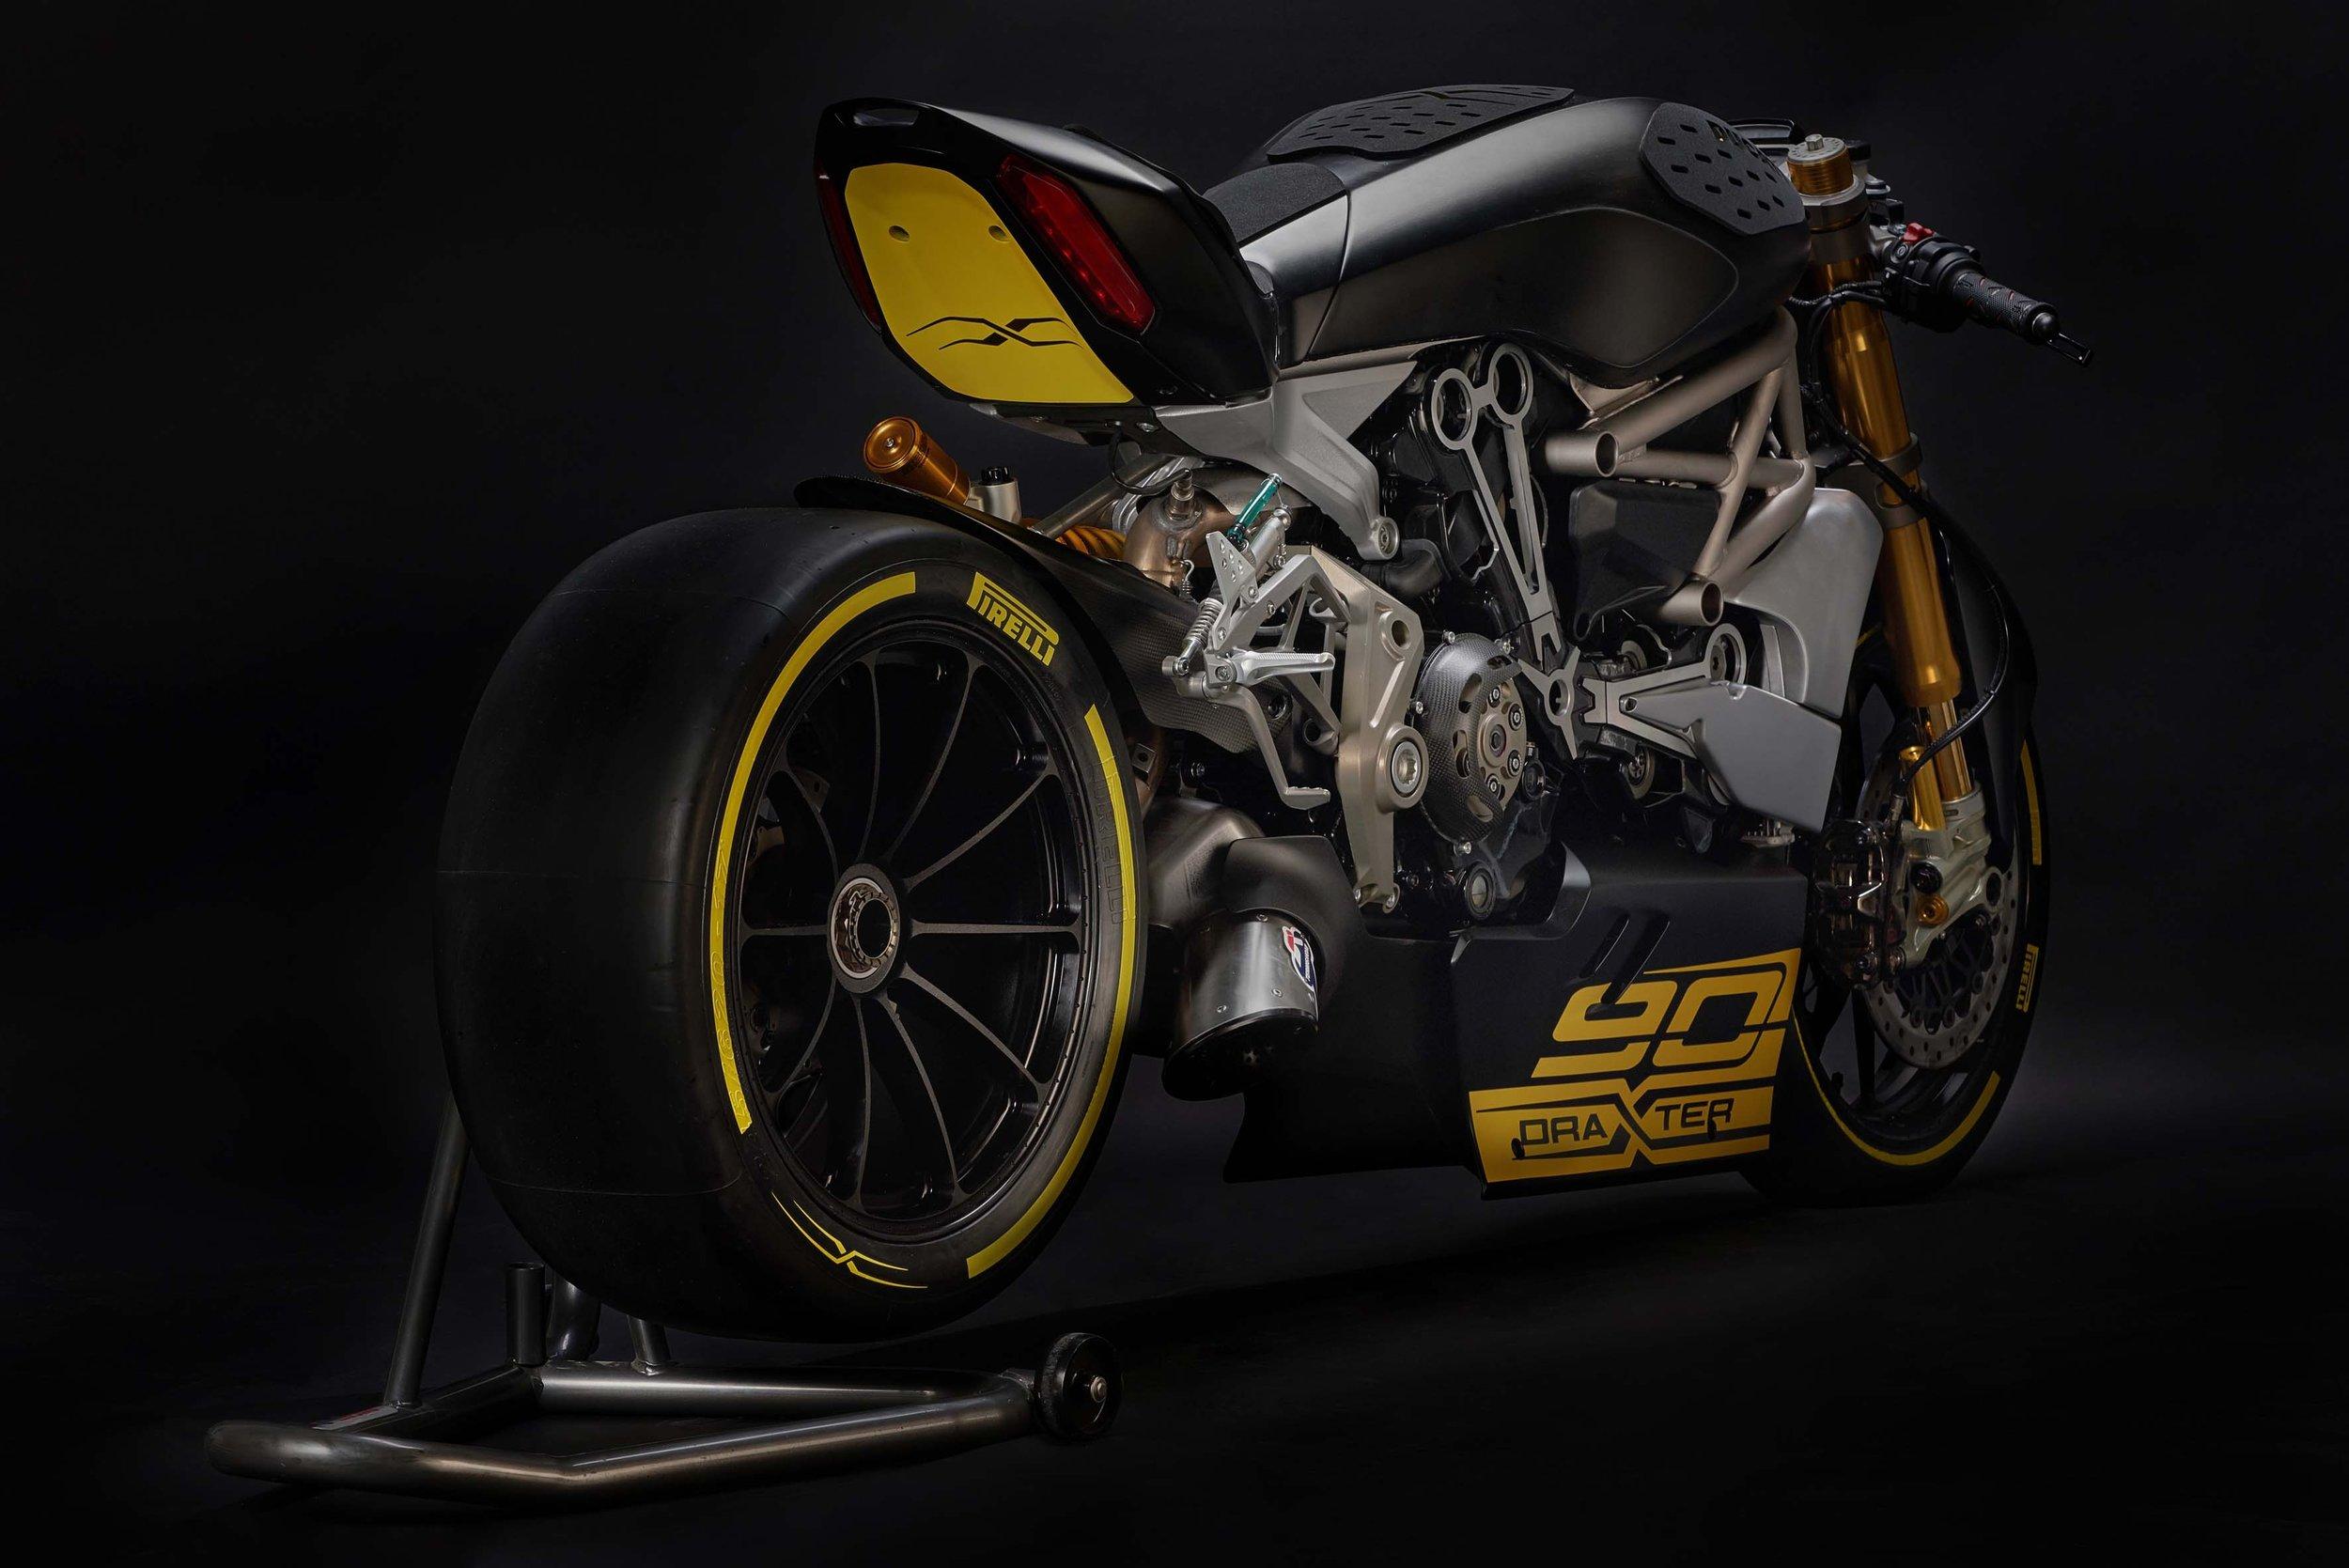 Ducati_Draxter_Concept_Drag_Bike_90th_Moto-Mucci (4).jpg